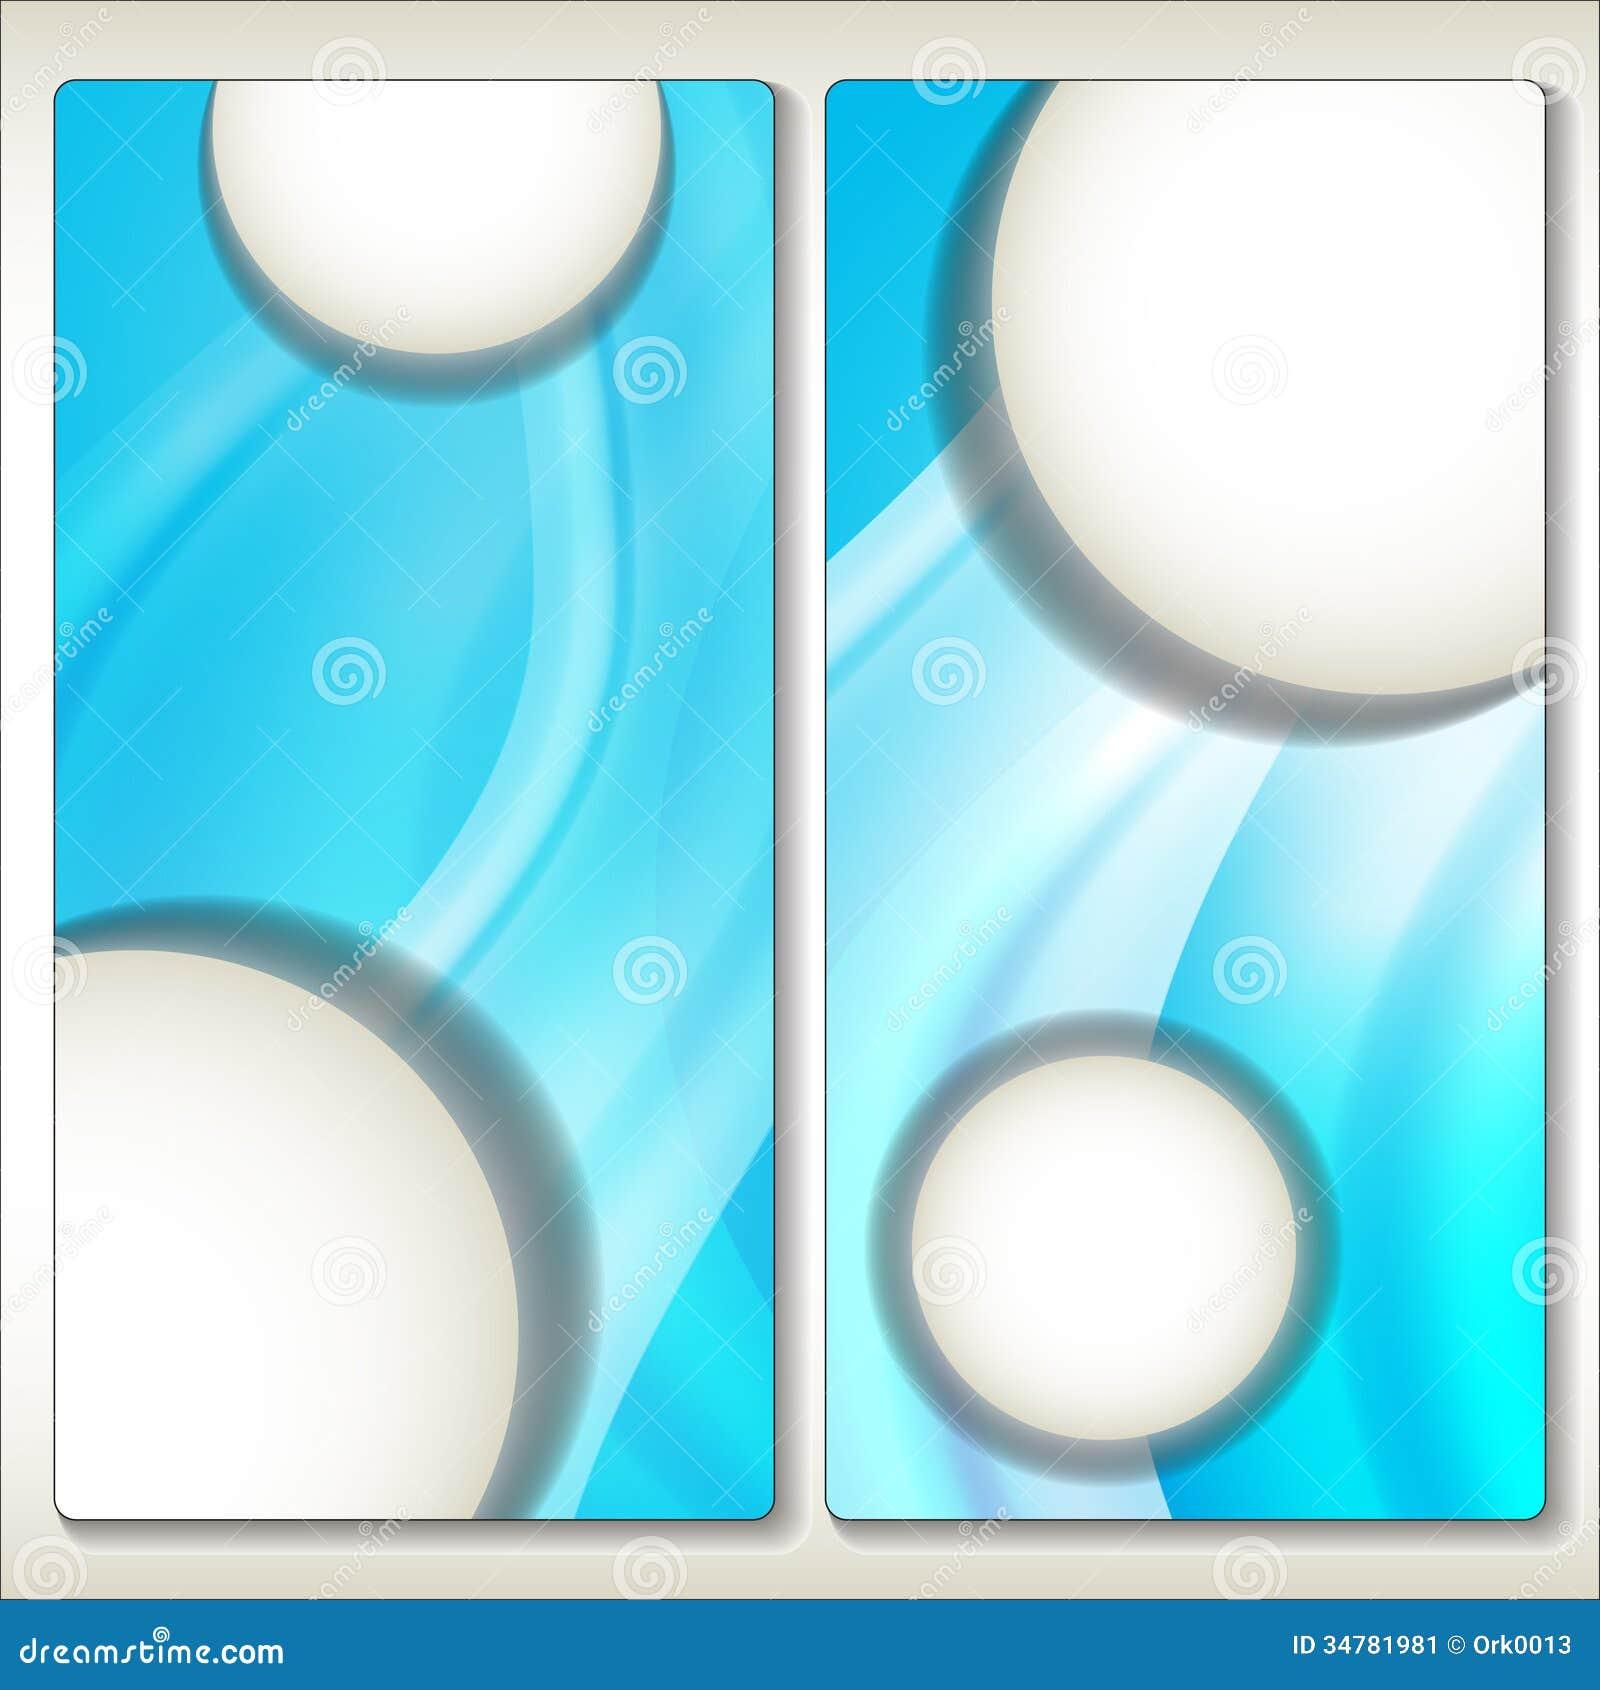 Custom Card Template advertising cards templates : Abstract brilliant advertising card template.